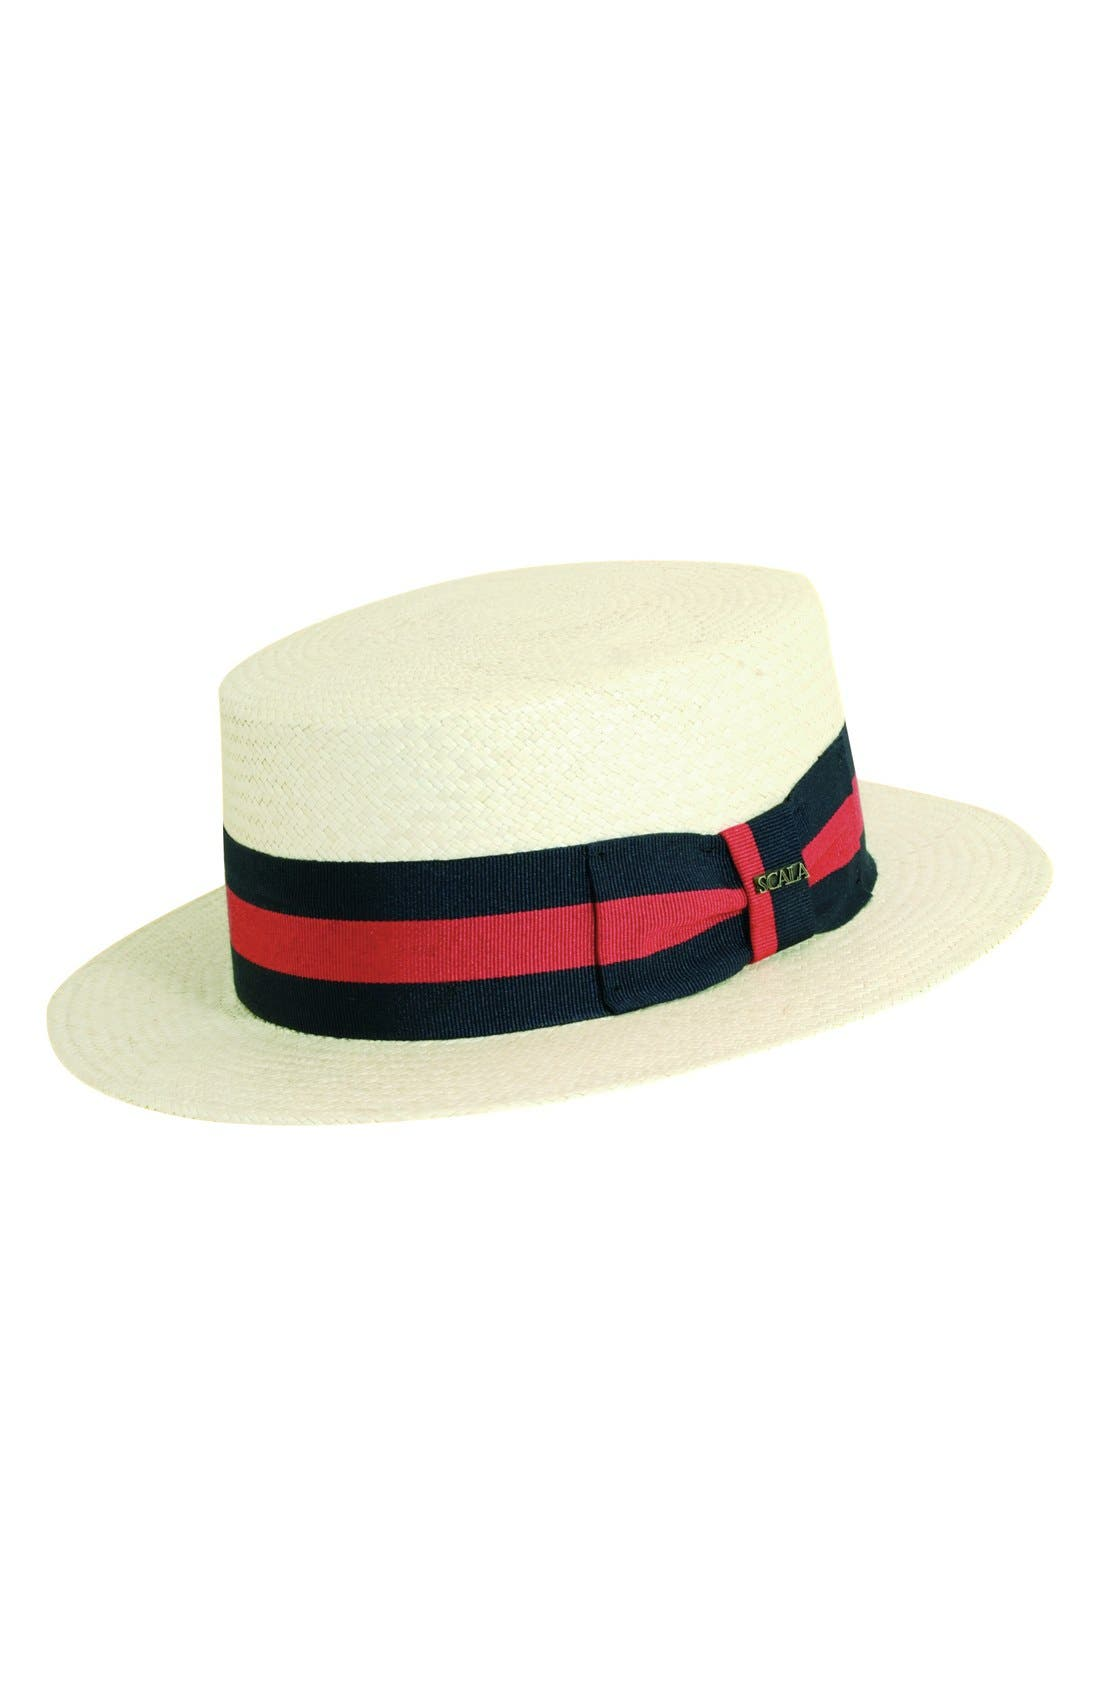 Panama Straw Boater Hat,                         Main,                         color, Natural